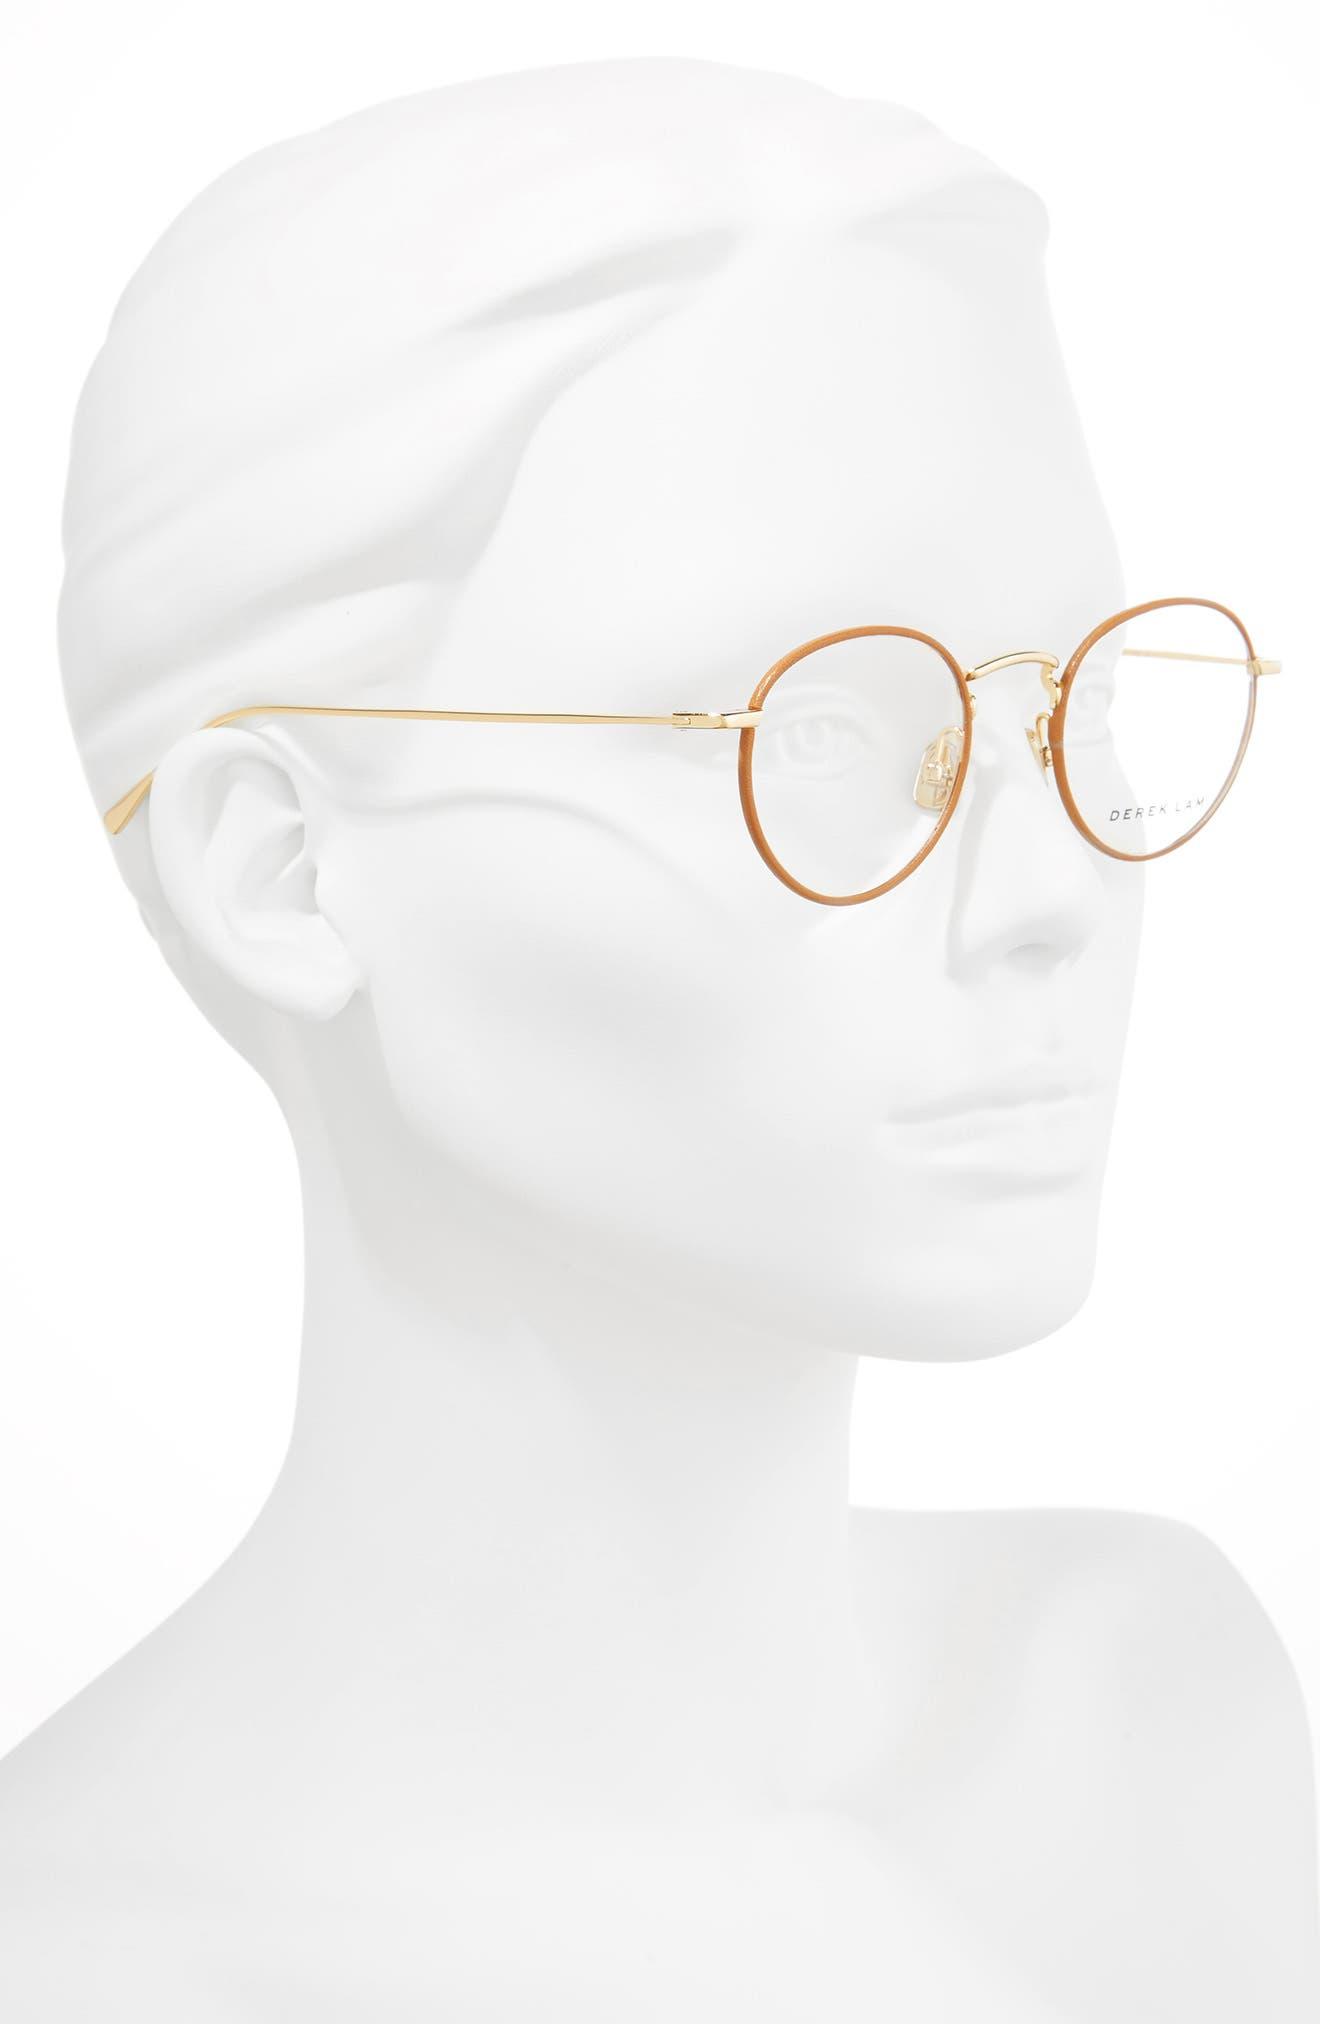 47mm Optical Glasses,                             Alternate thumbnail 2, color,                             TAN